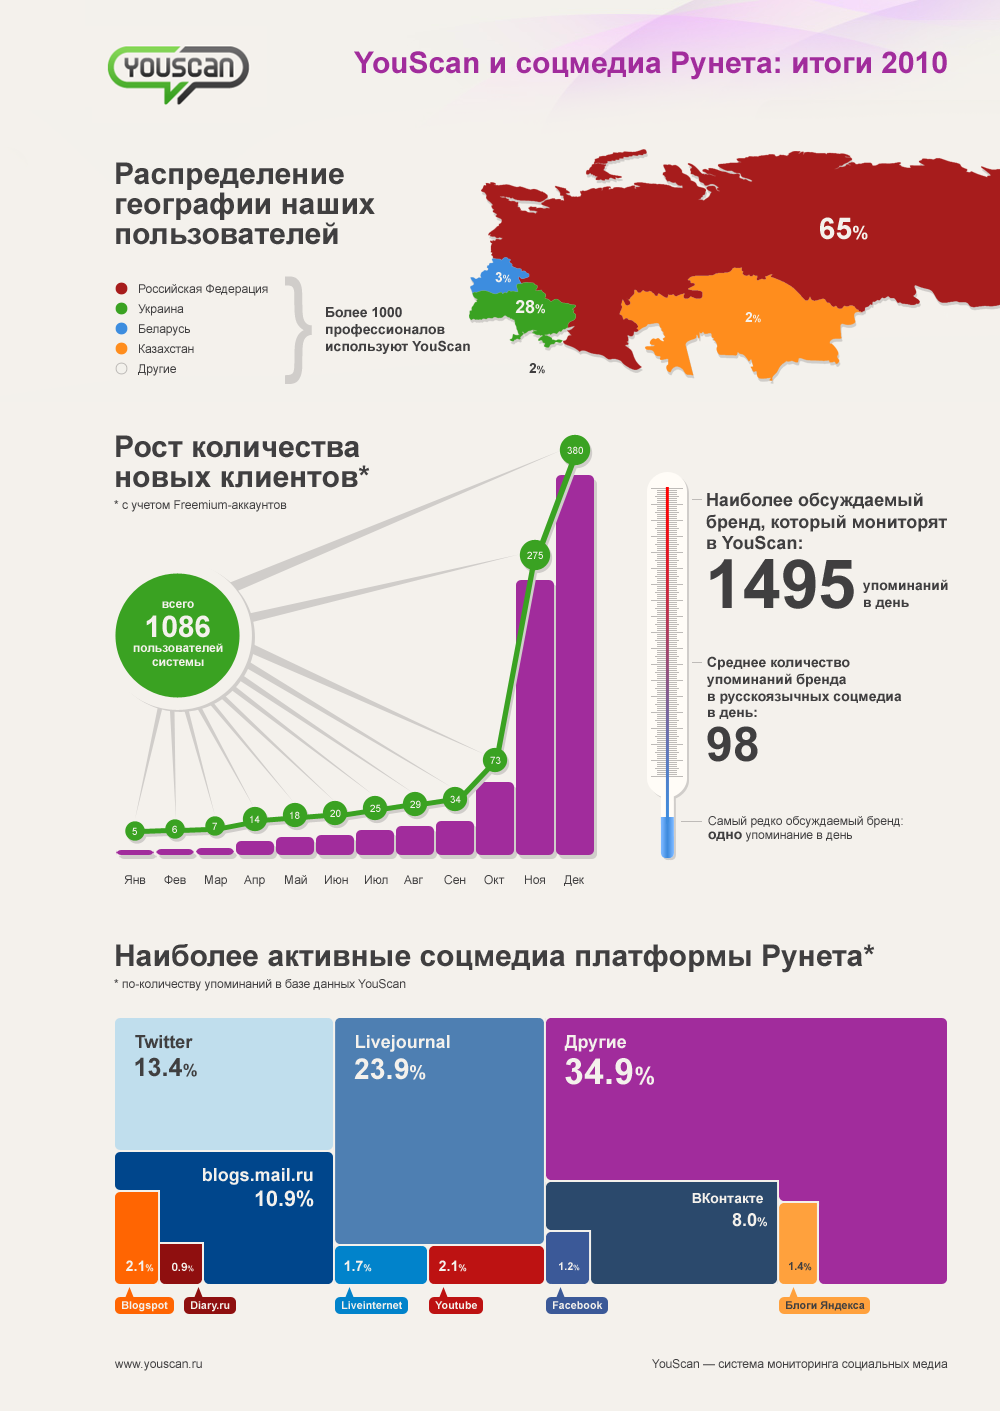 YouScan и соцмедиа Рунета: итоги 2010